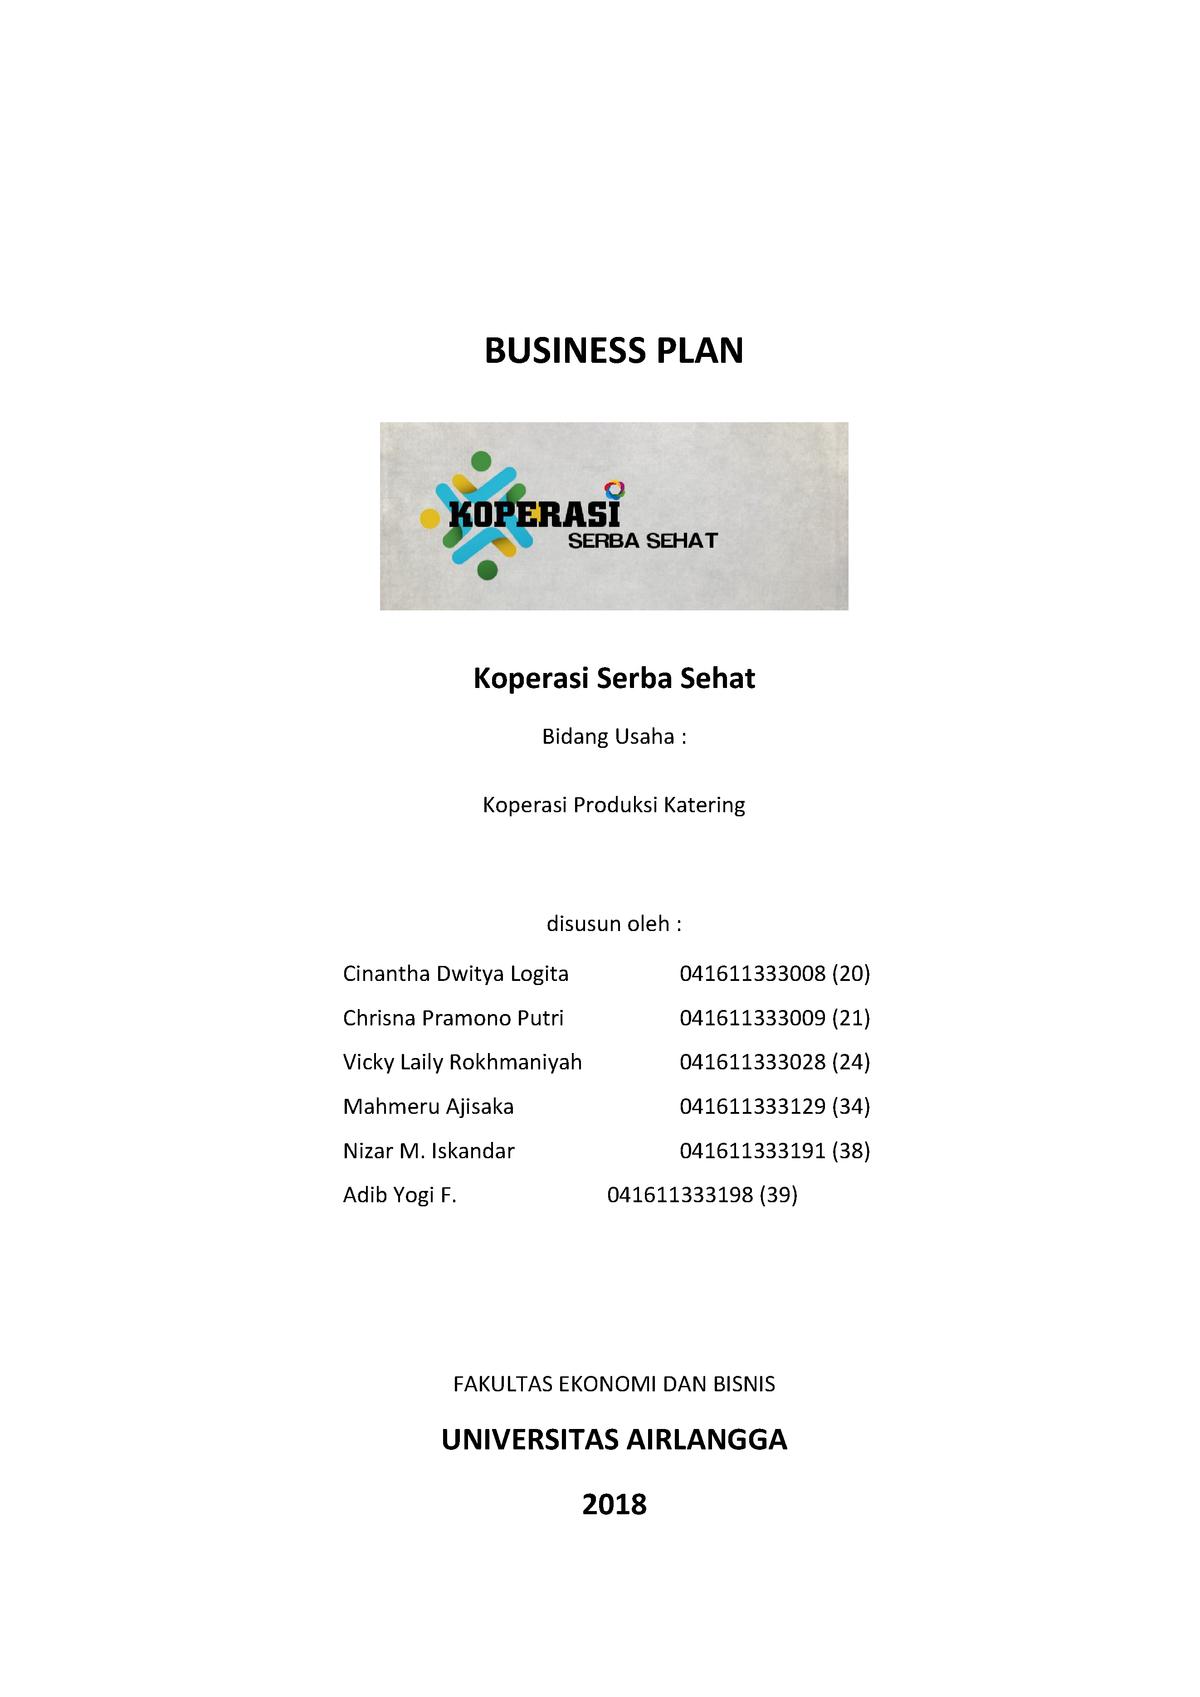 Business Plan Fresh Healthy Food Koperasi Serba Sehat Business Plan Koperasi Studocu